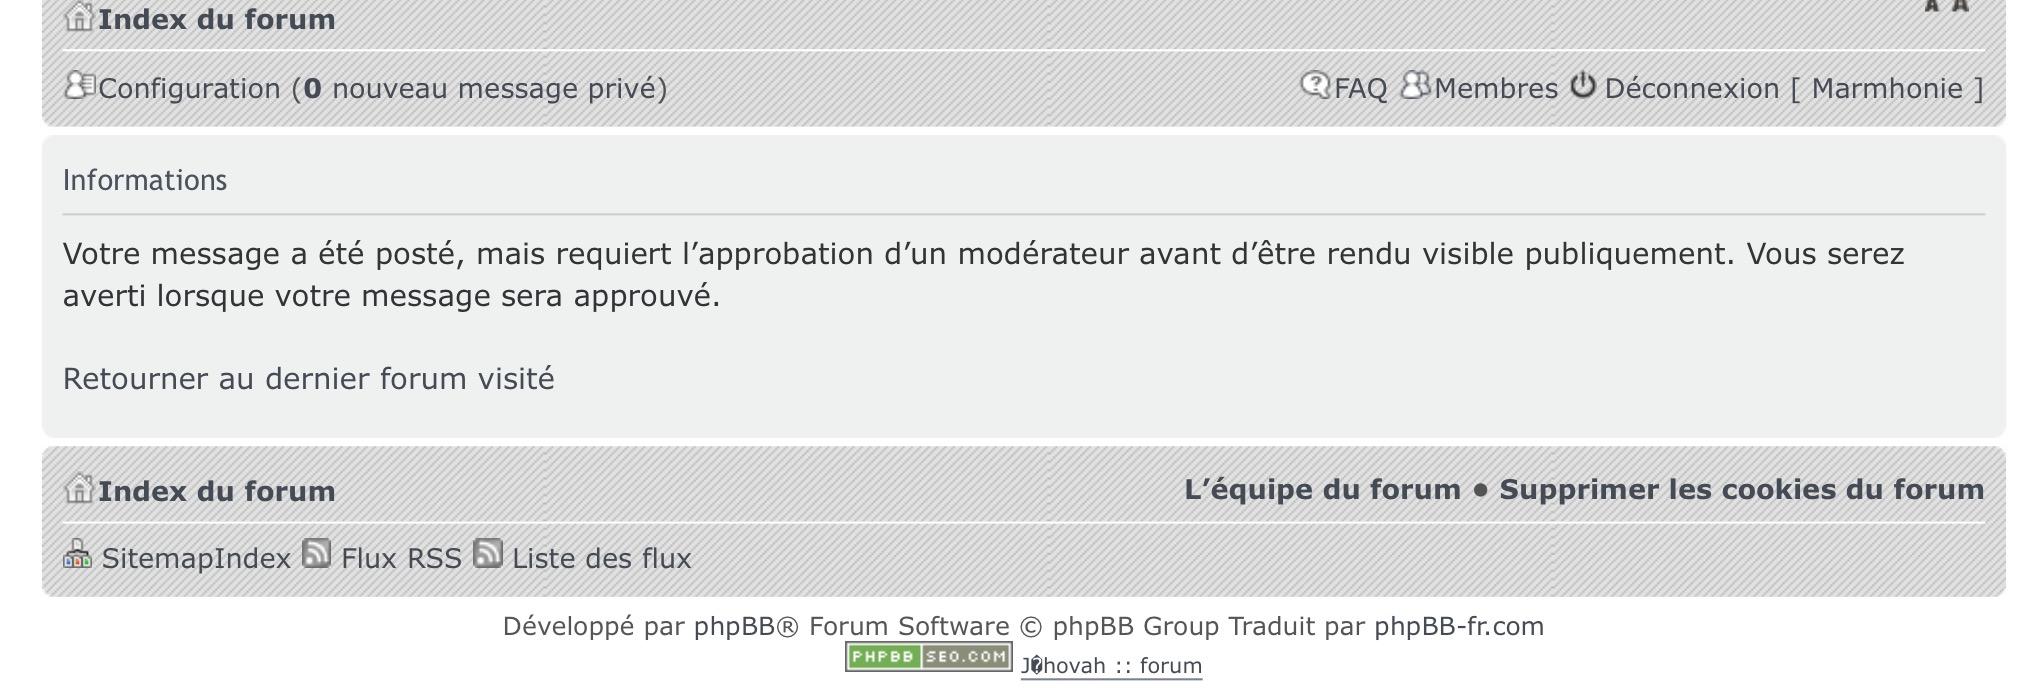 Marmhonie : présentation humble Img_0283-53ac592